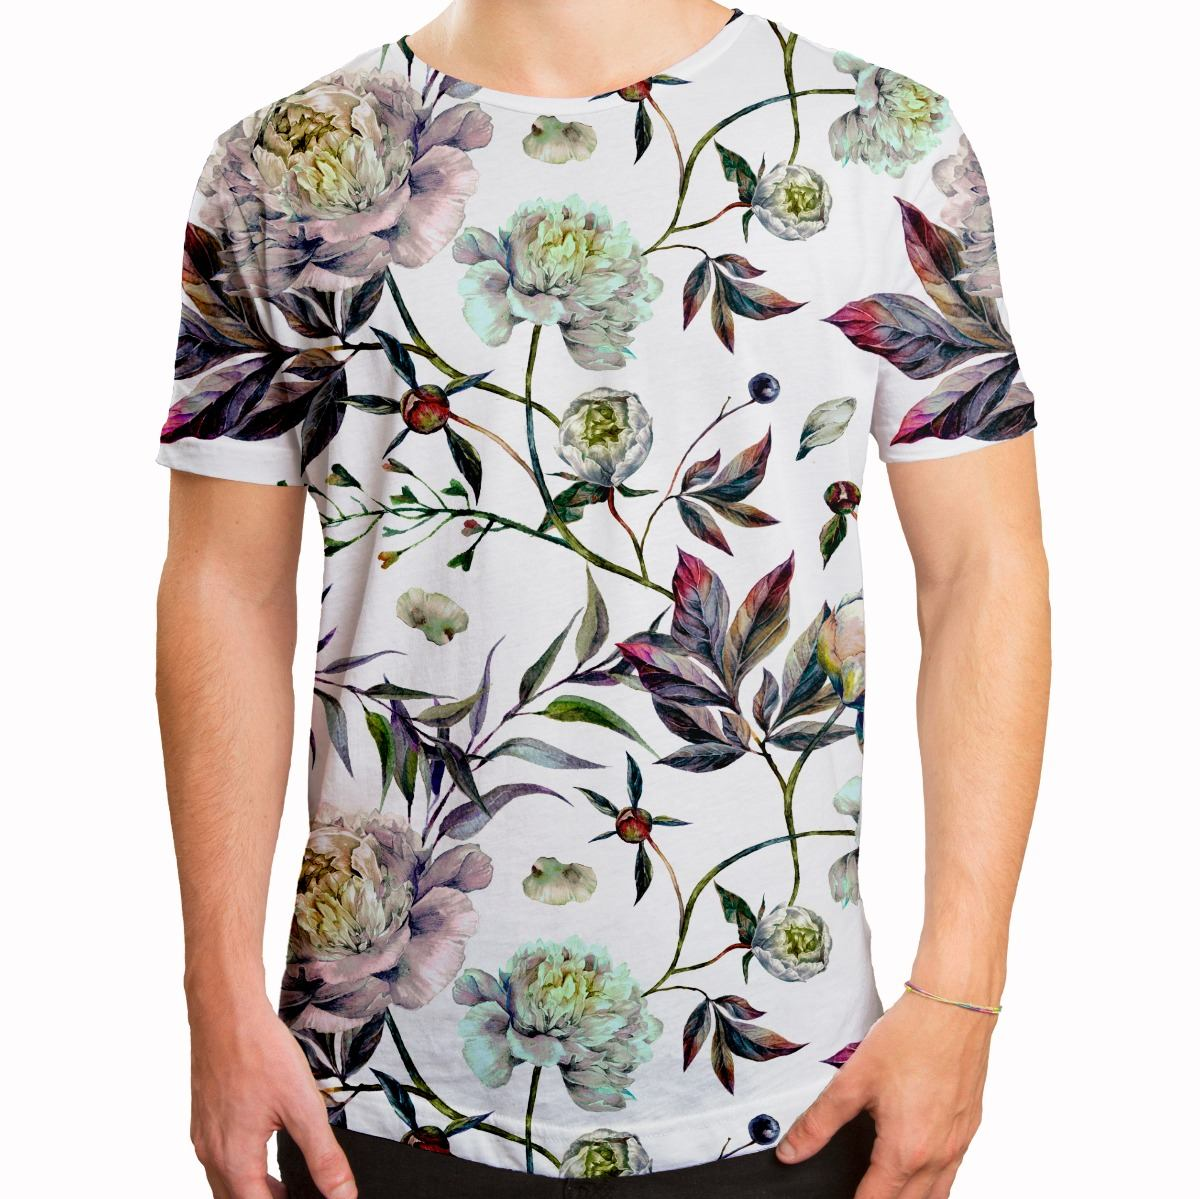 87f0ab133 camiseta masculina longline swag floral aquarela. Carregando zoom.